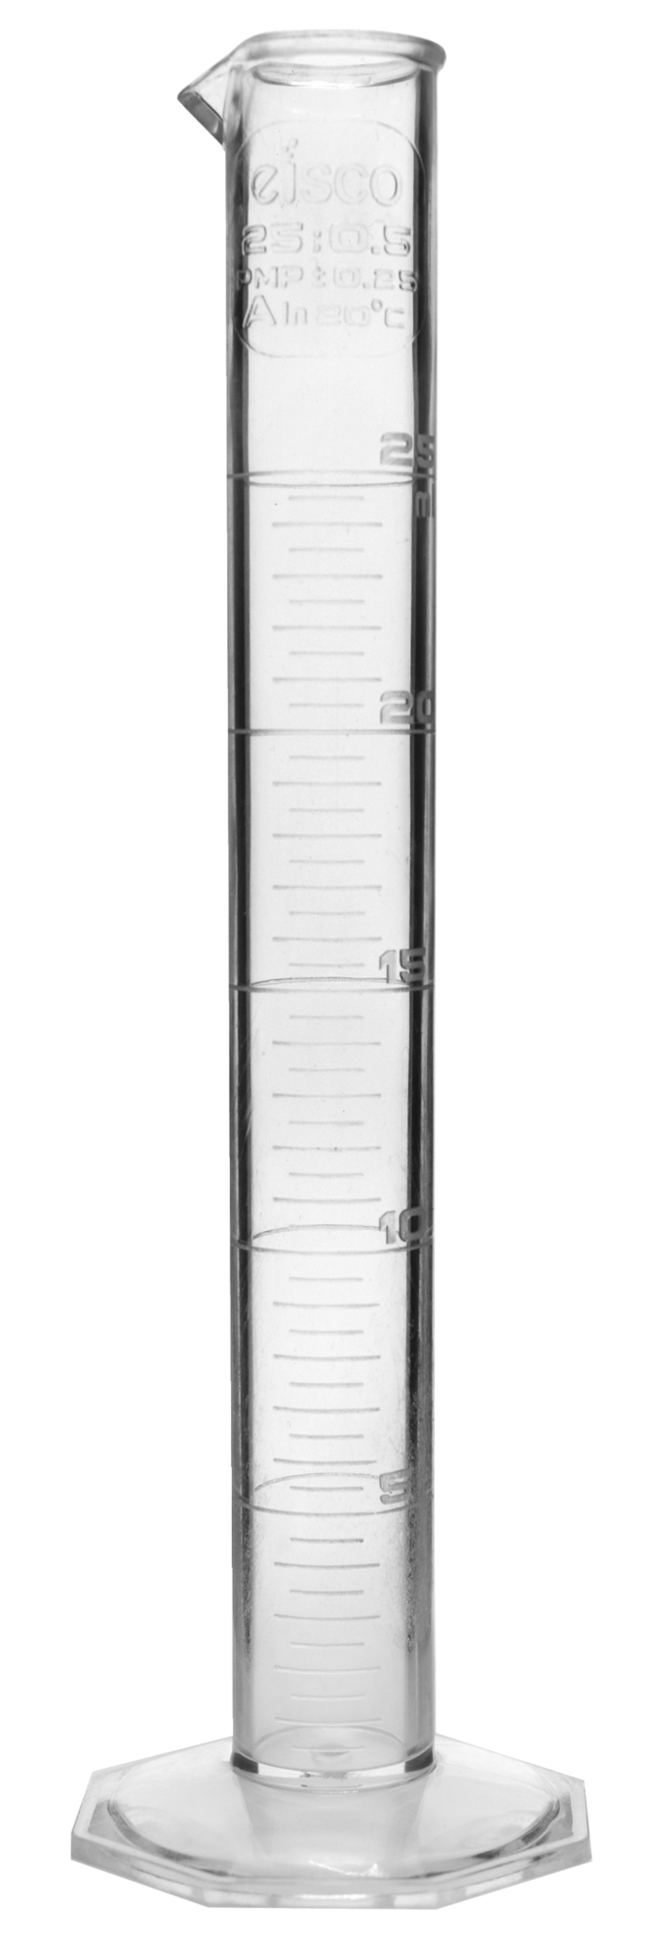 Cylinders, Item Number 2022050